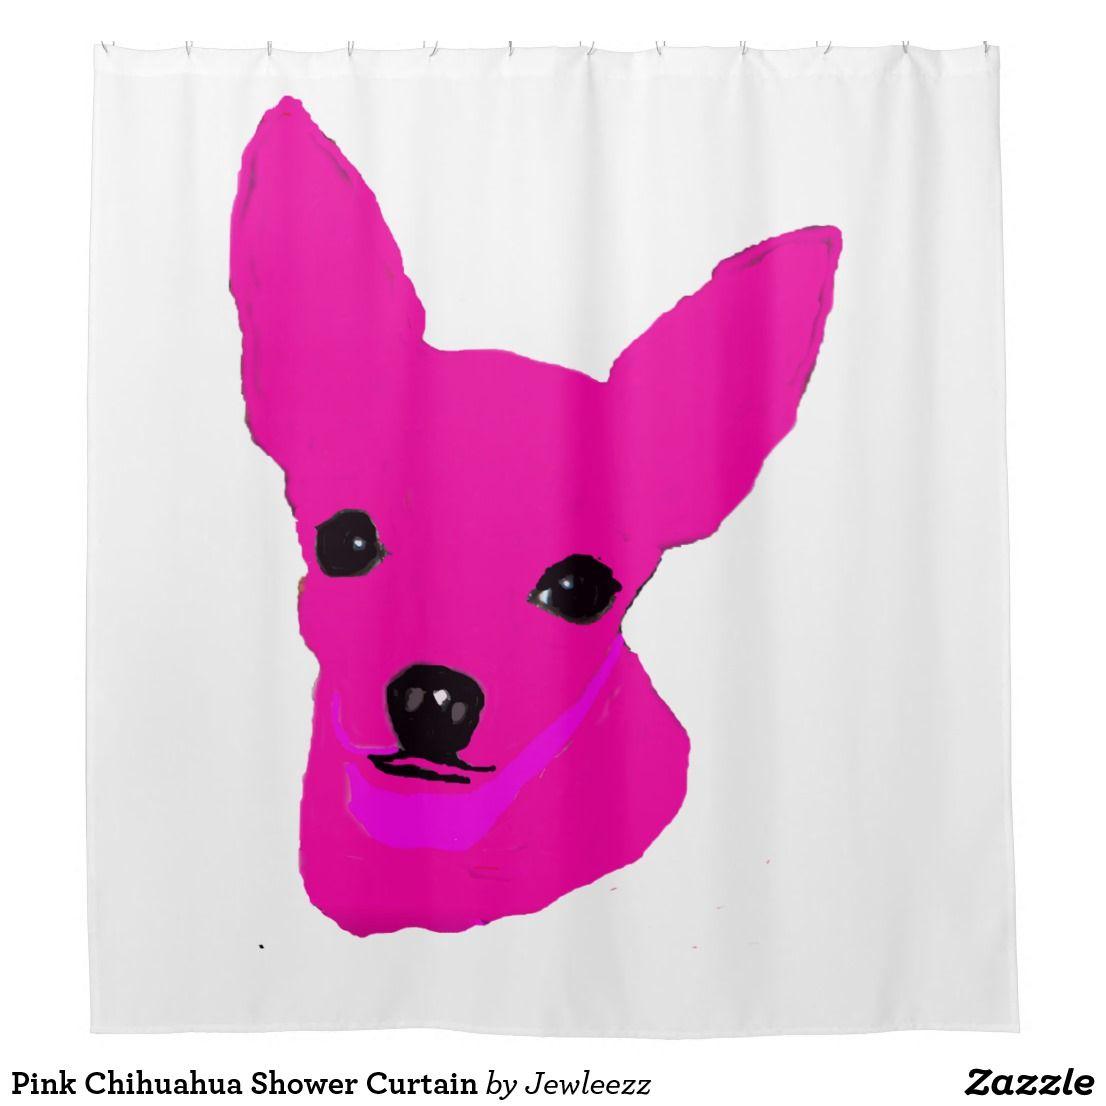 Pink Chihuahua Shower Curtain Zazzle Com Chihuahua Pink Shower